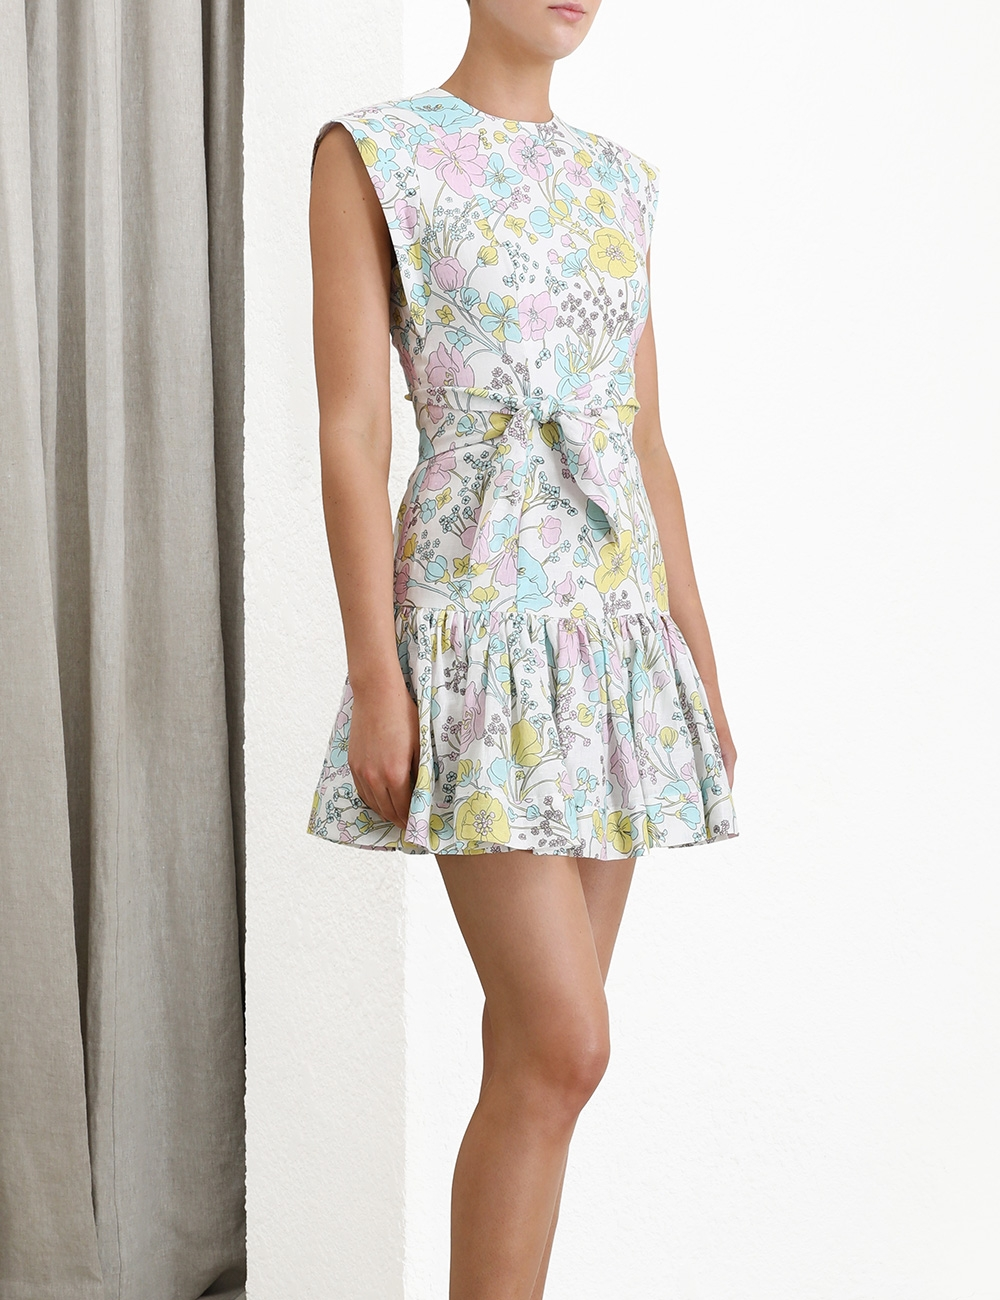 Peggy Flounce Short Dress